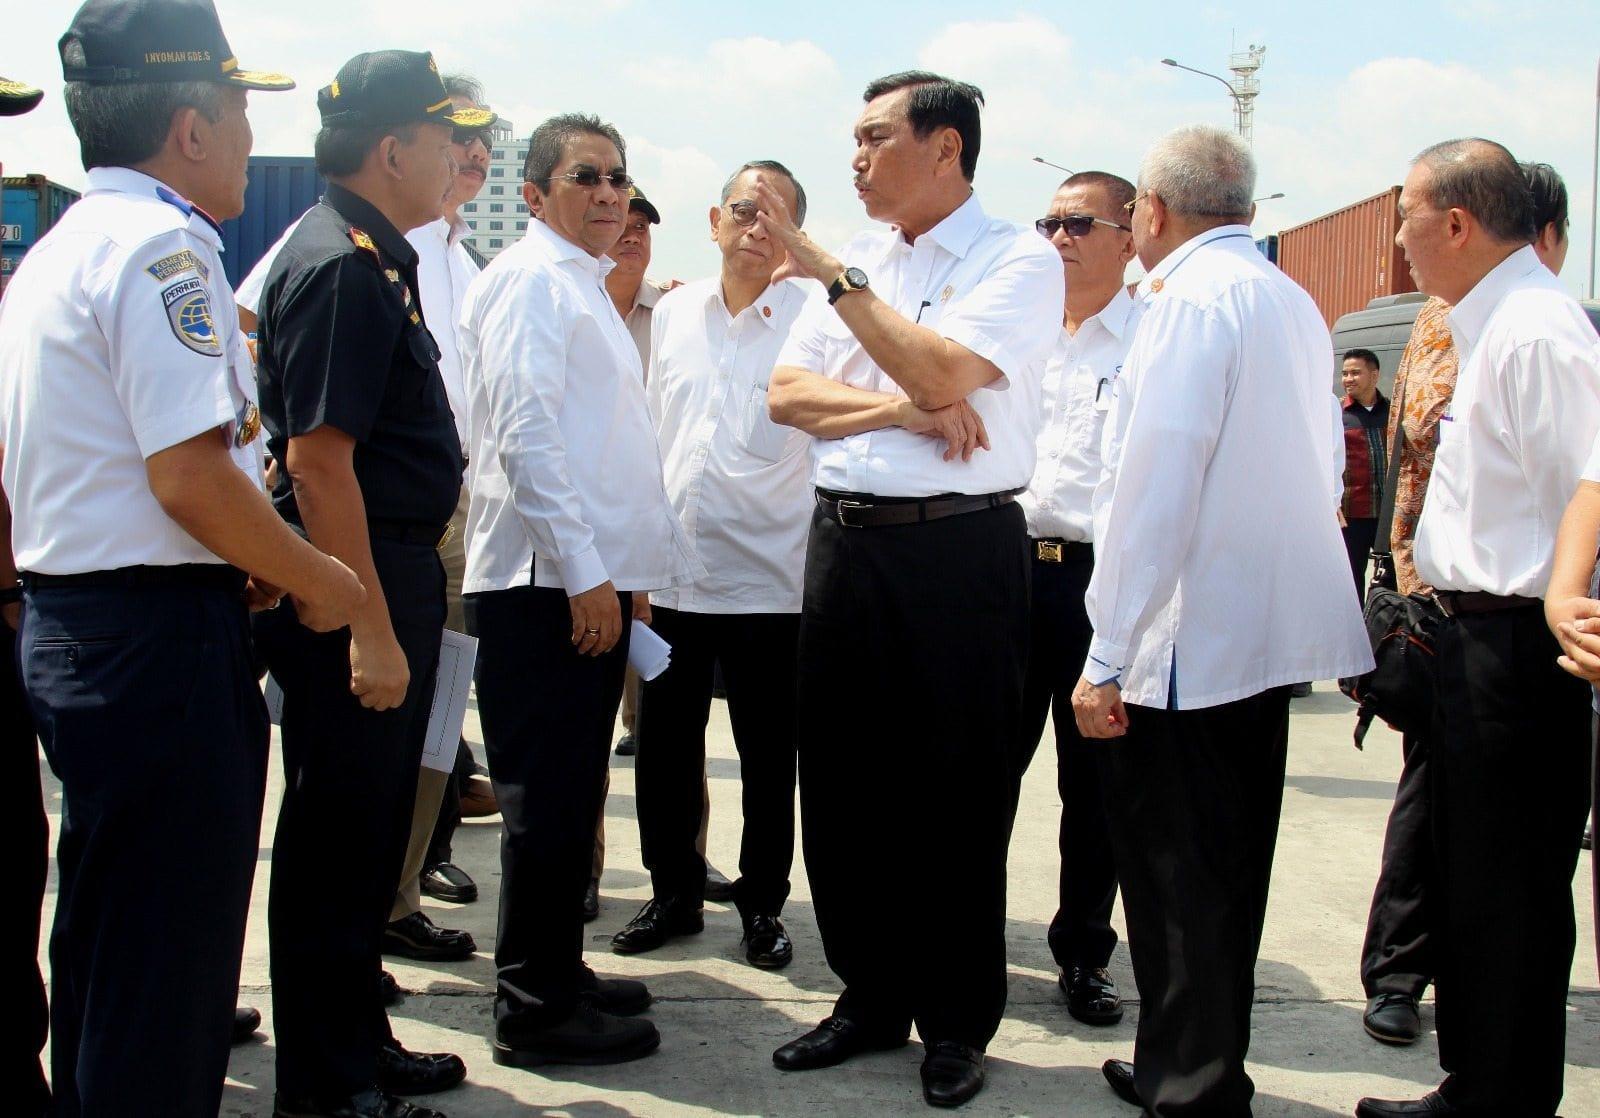 Menko Luhut Kunjungan Kerja ke Pelabuhan Indonesia II (Pelindo II)